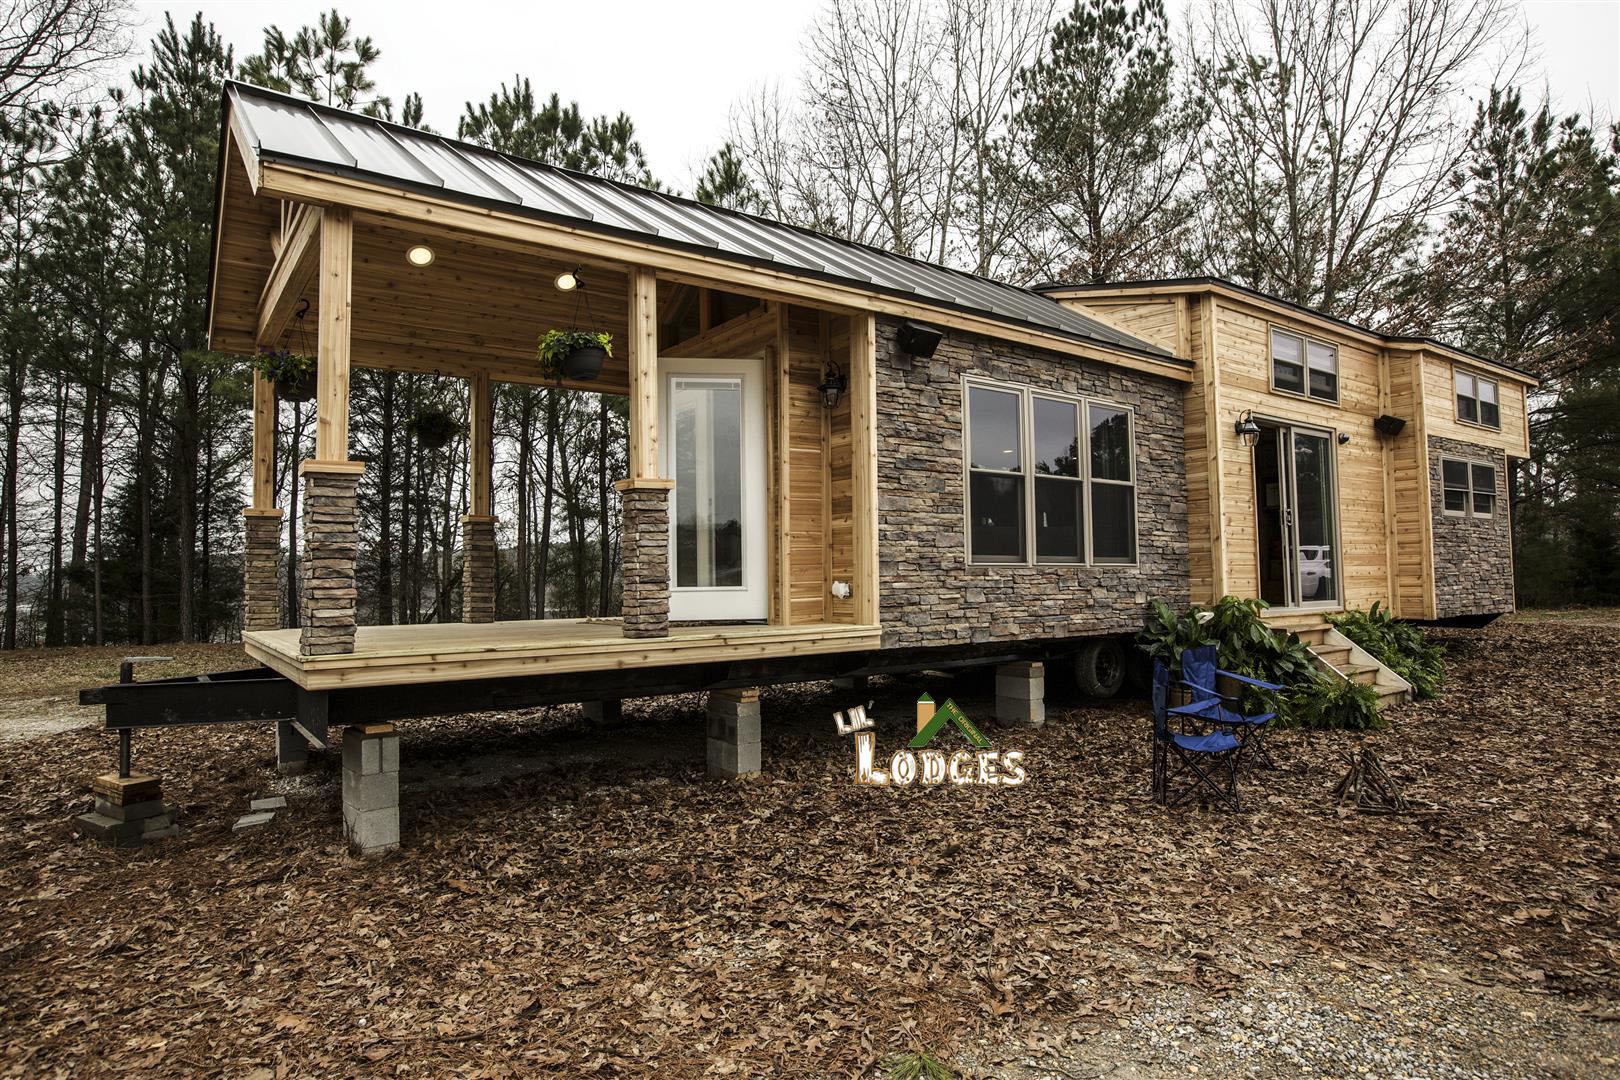 tiny homes custom made in alabama architects and artisans